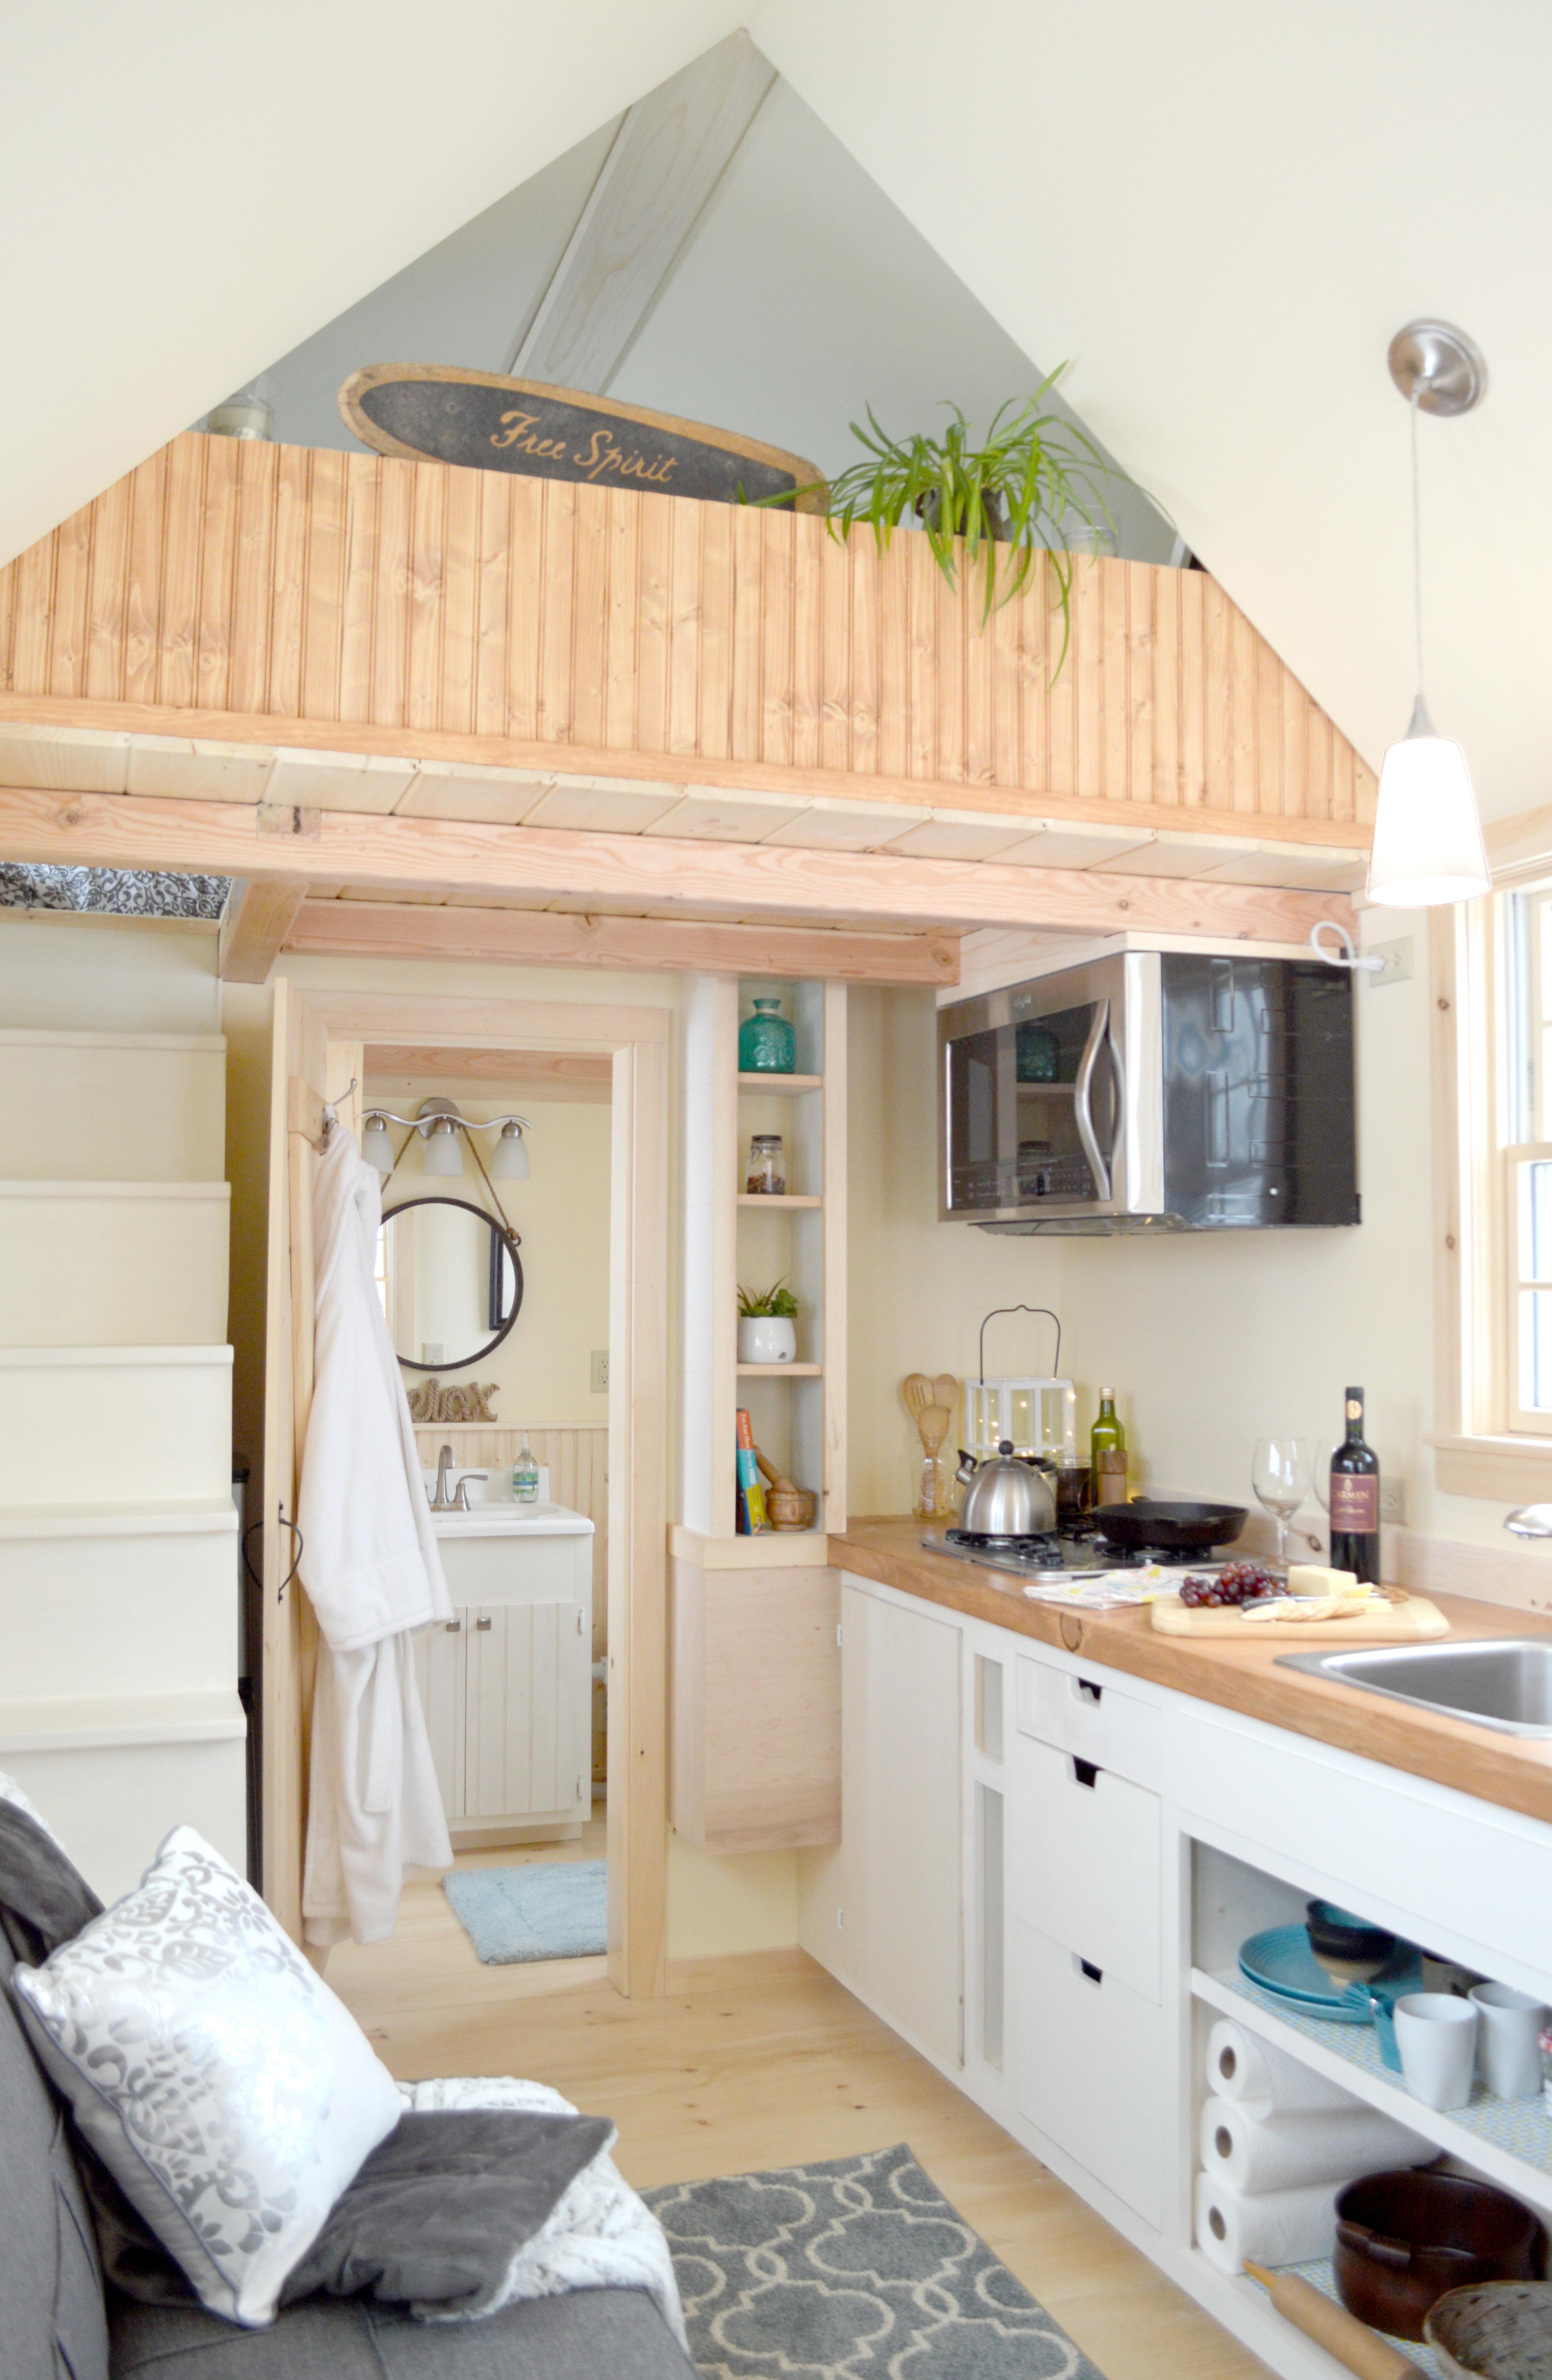 Hudson River Tiny Homes interior